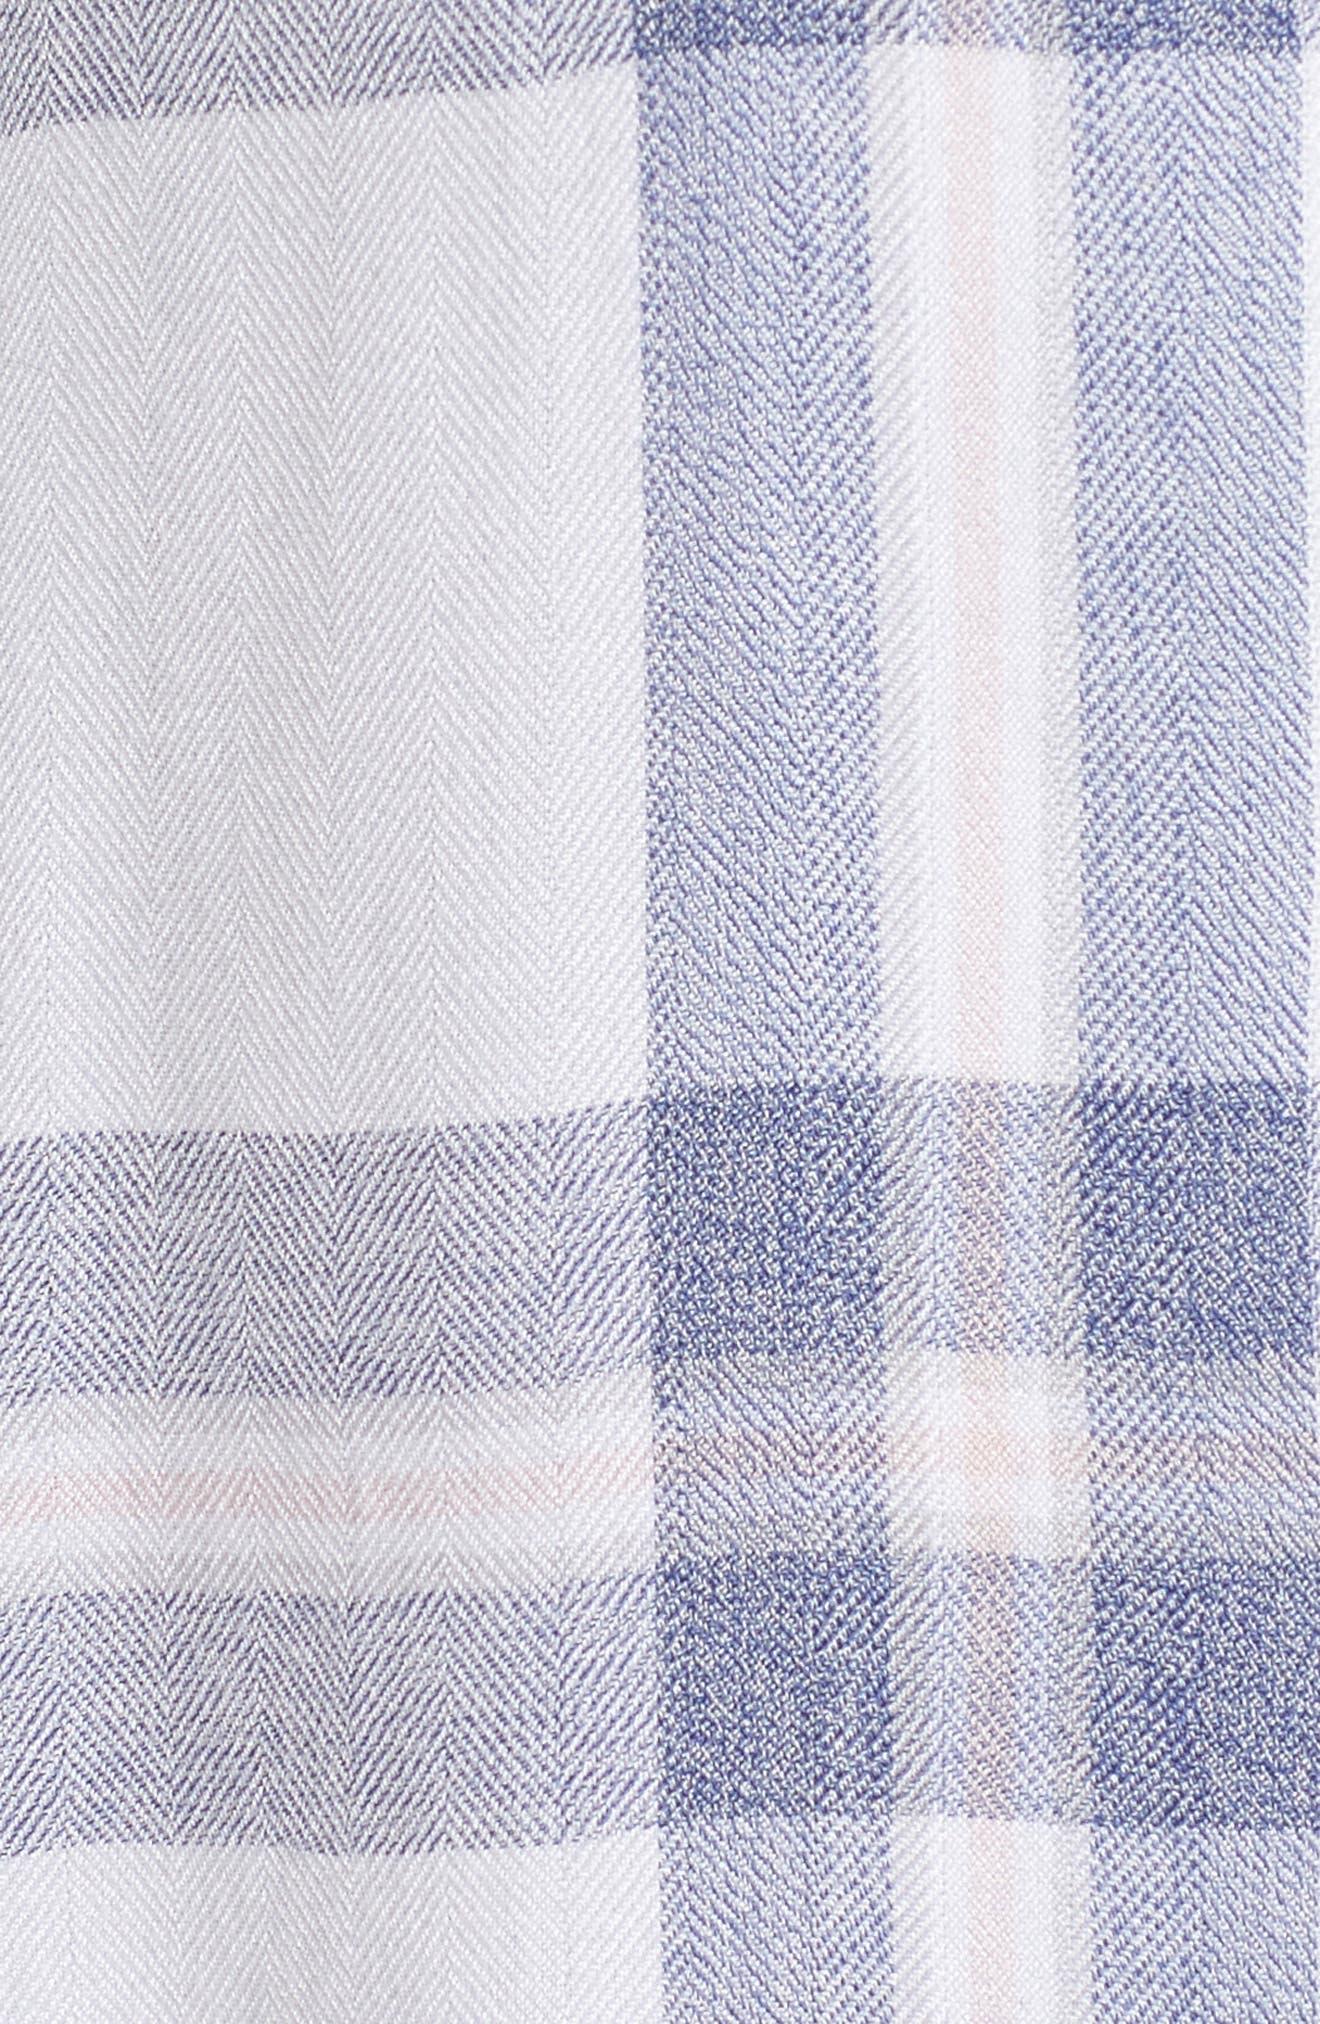 Plaid Pajamas,                             Alternate thumbnail 5, color,                             WHITE/ CHAMBRAY/ PETAL